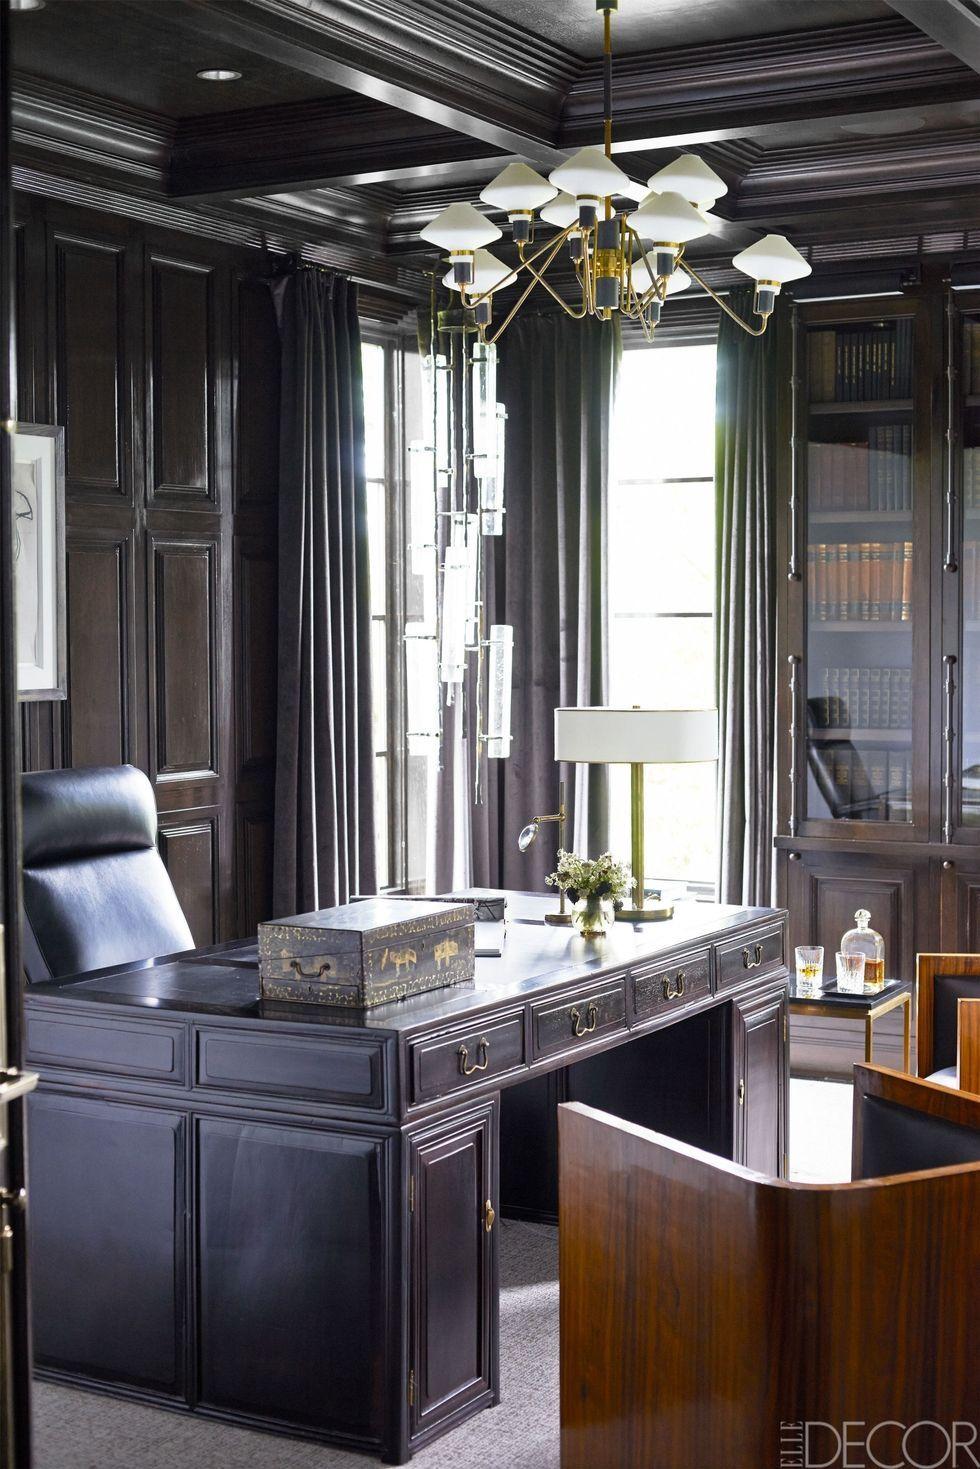 Ideas for a home office Design Ideas Homeofficeideas Elle Decor Stylish Home Office Ideas Chic Home Study